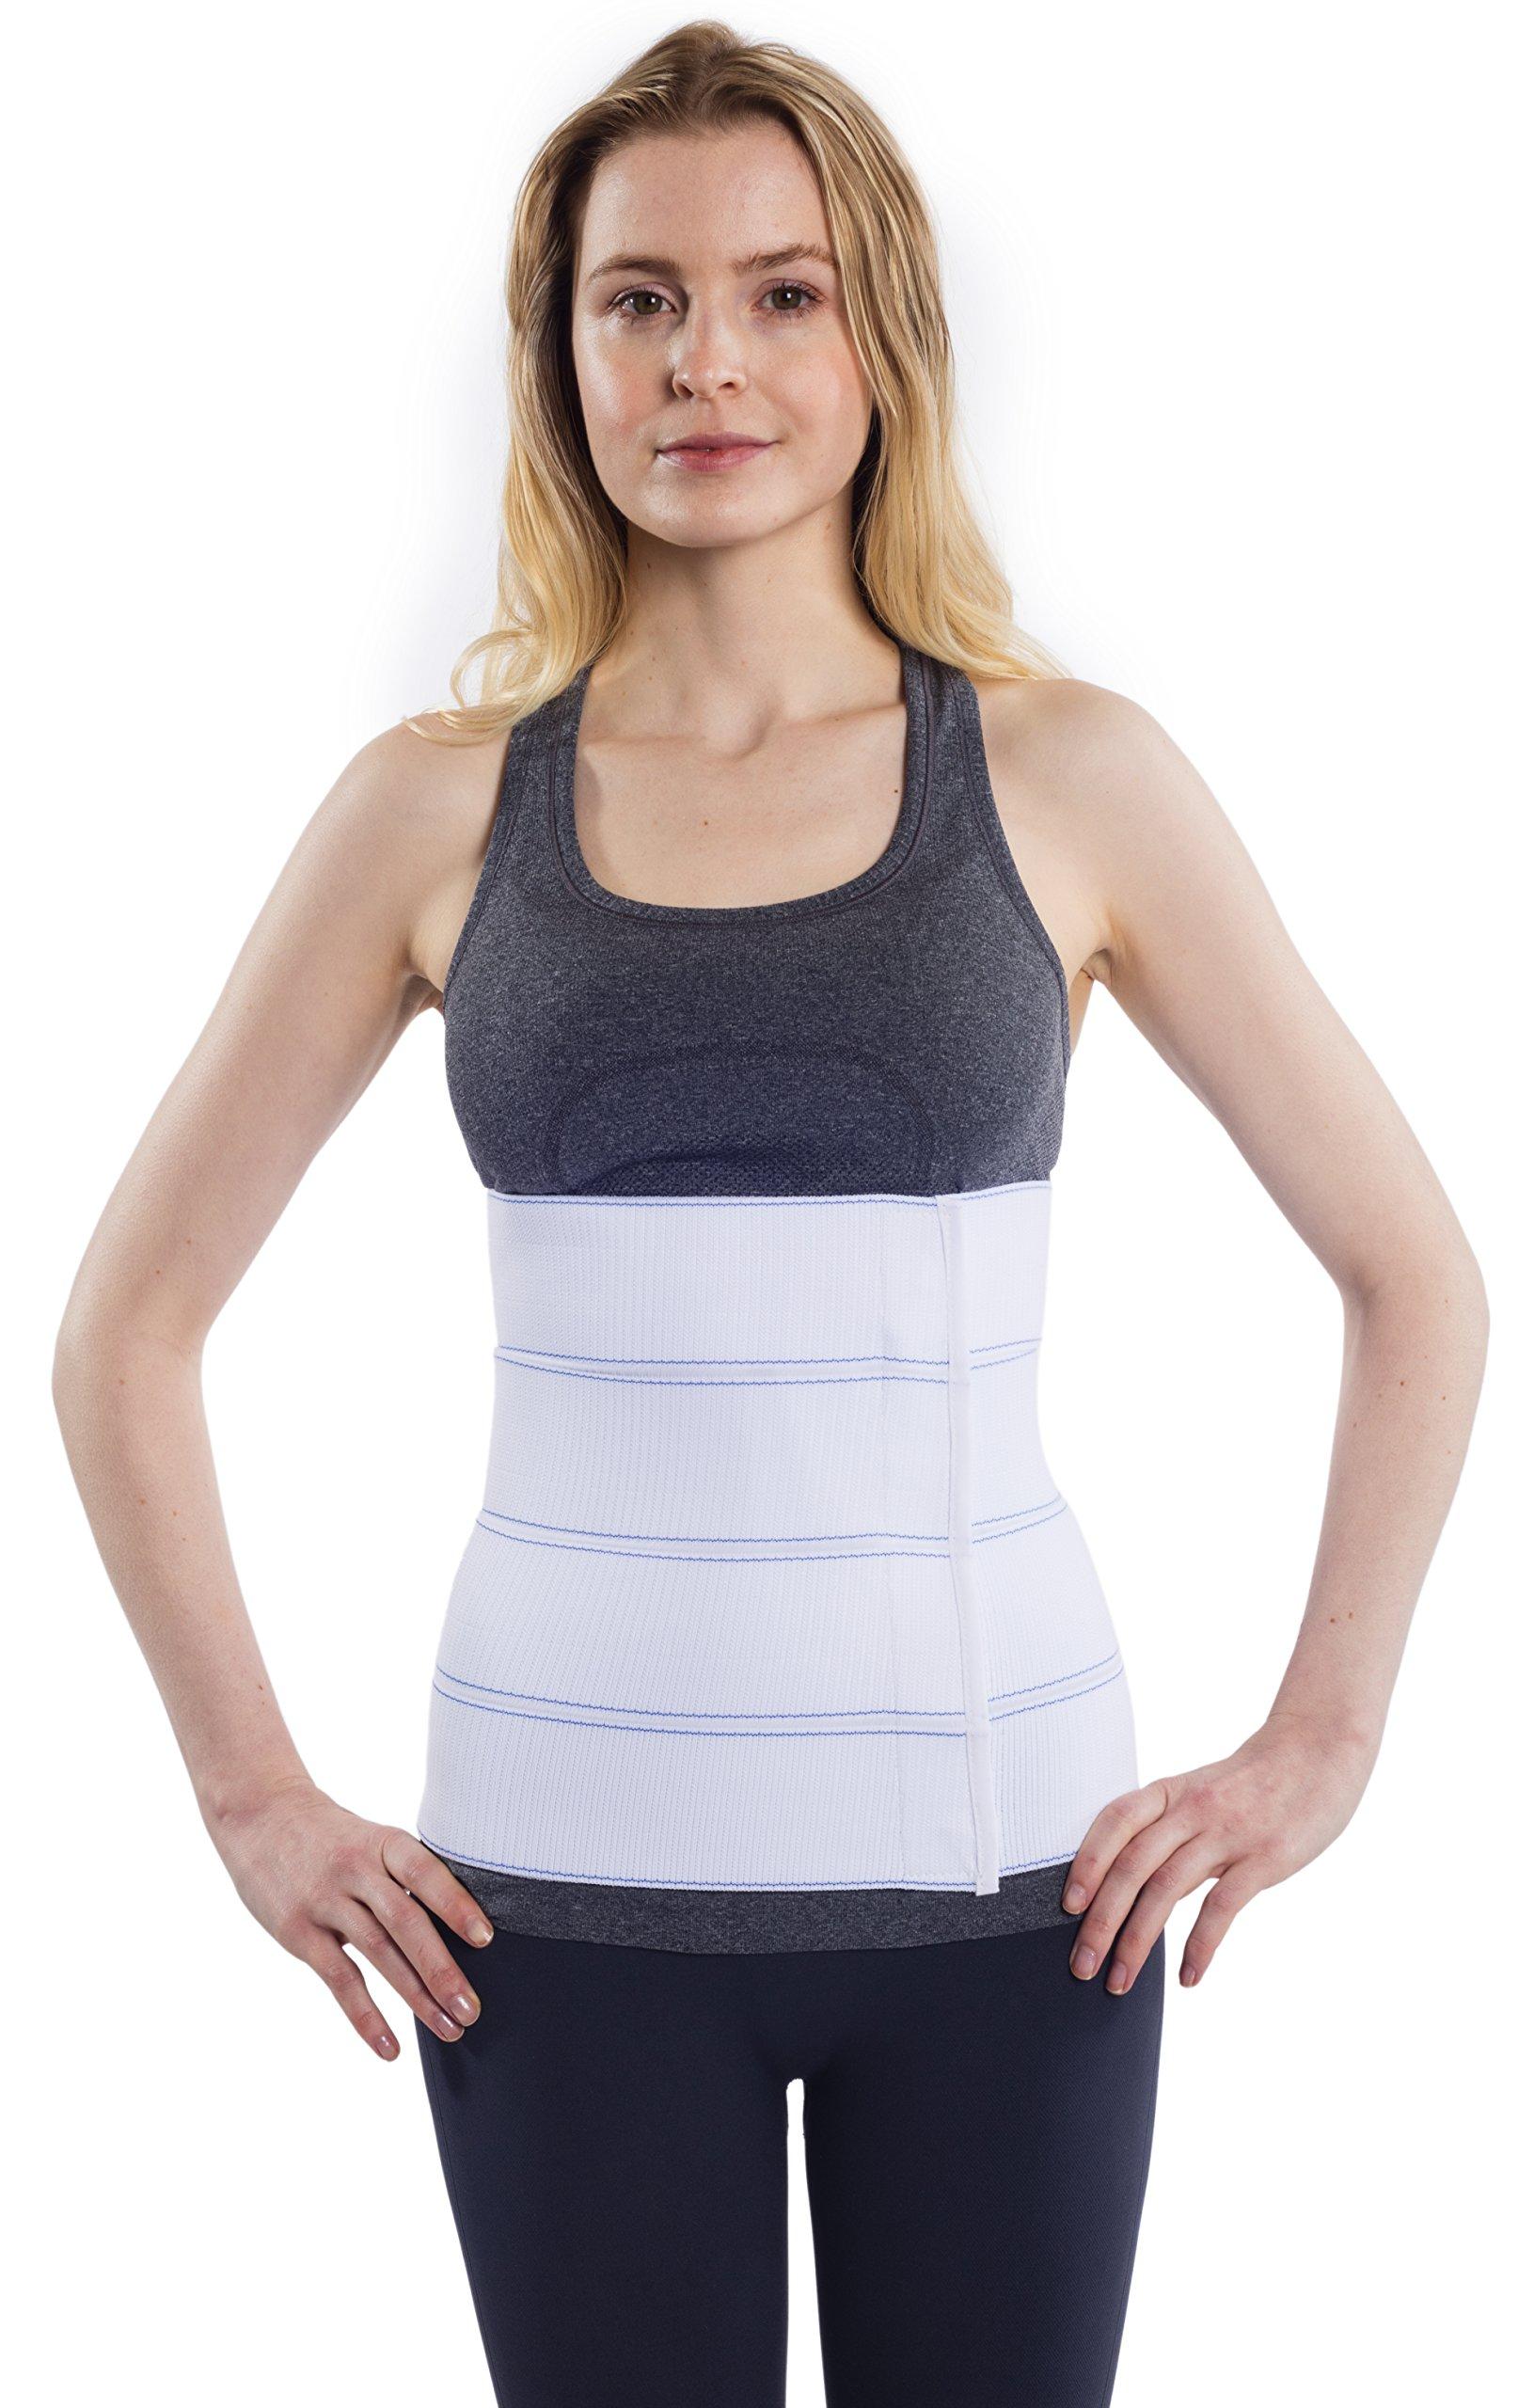 NYOrtho Abdominal Binder Lower Back Support Belt - Compression Wrap for Men and Women (46'' - 62'') 4 PANEL - 12''